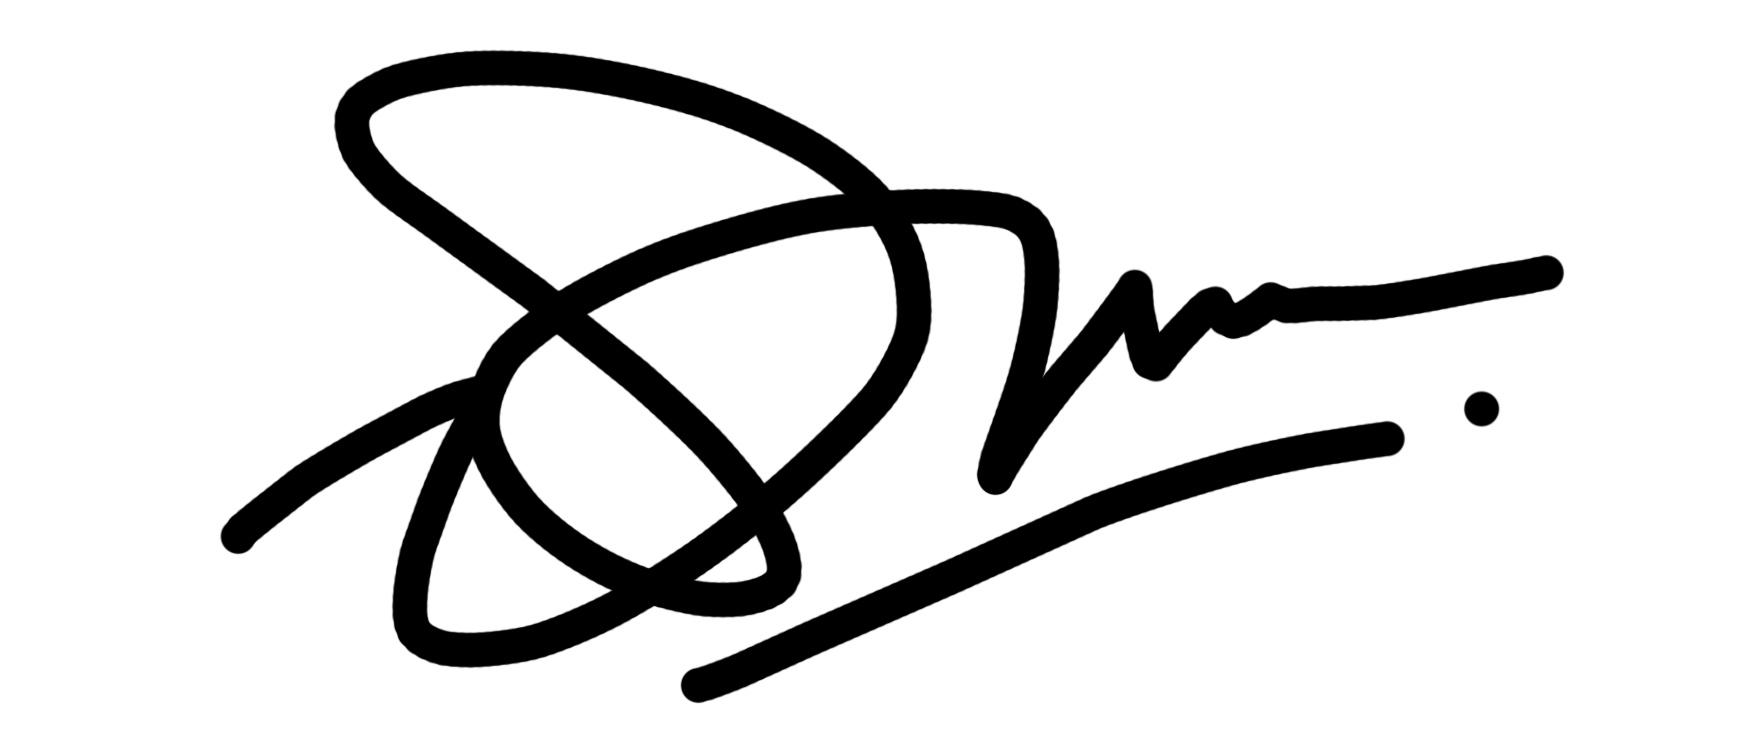 danu yudhistiro Signature